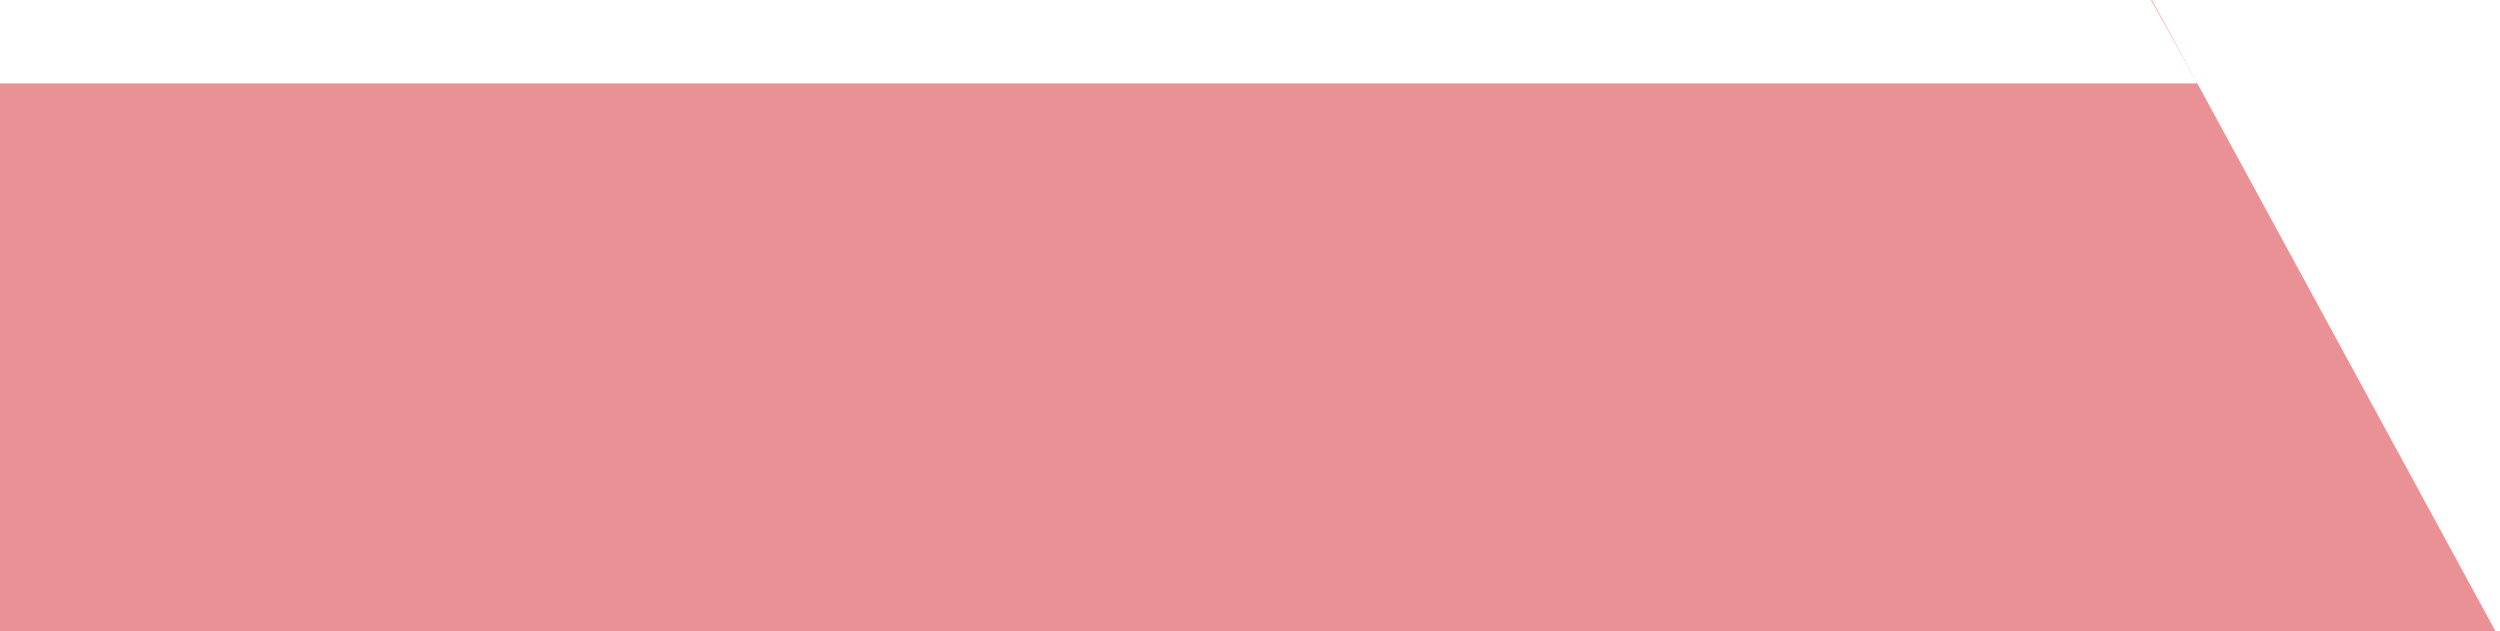 Logo Veehandel en Varkenshandel Frans Ter Haar